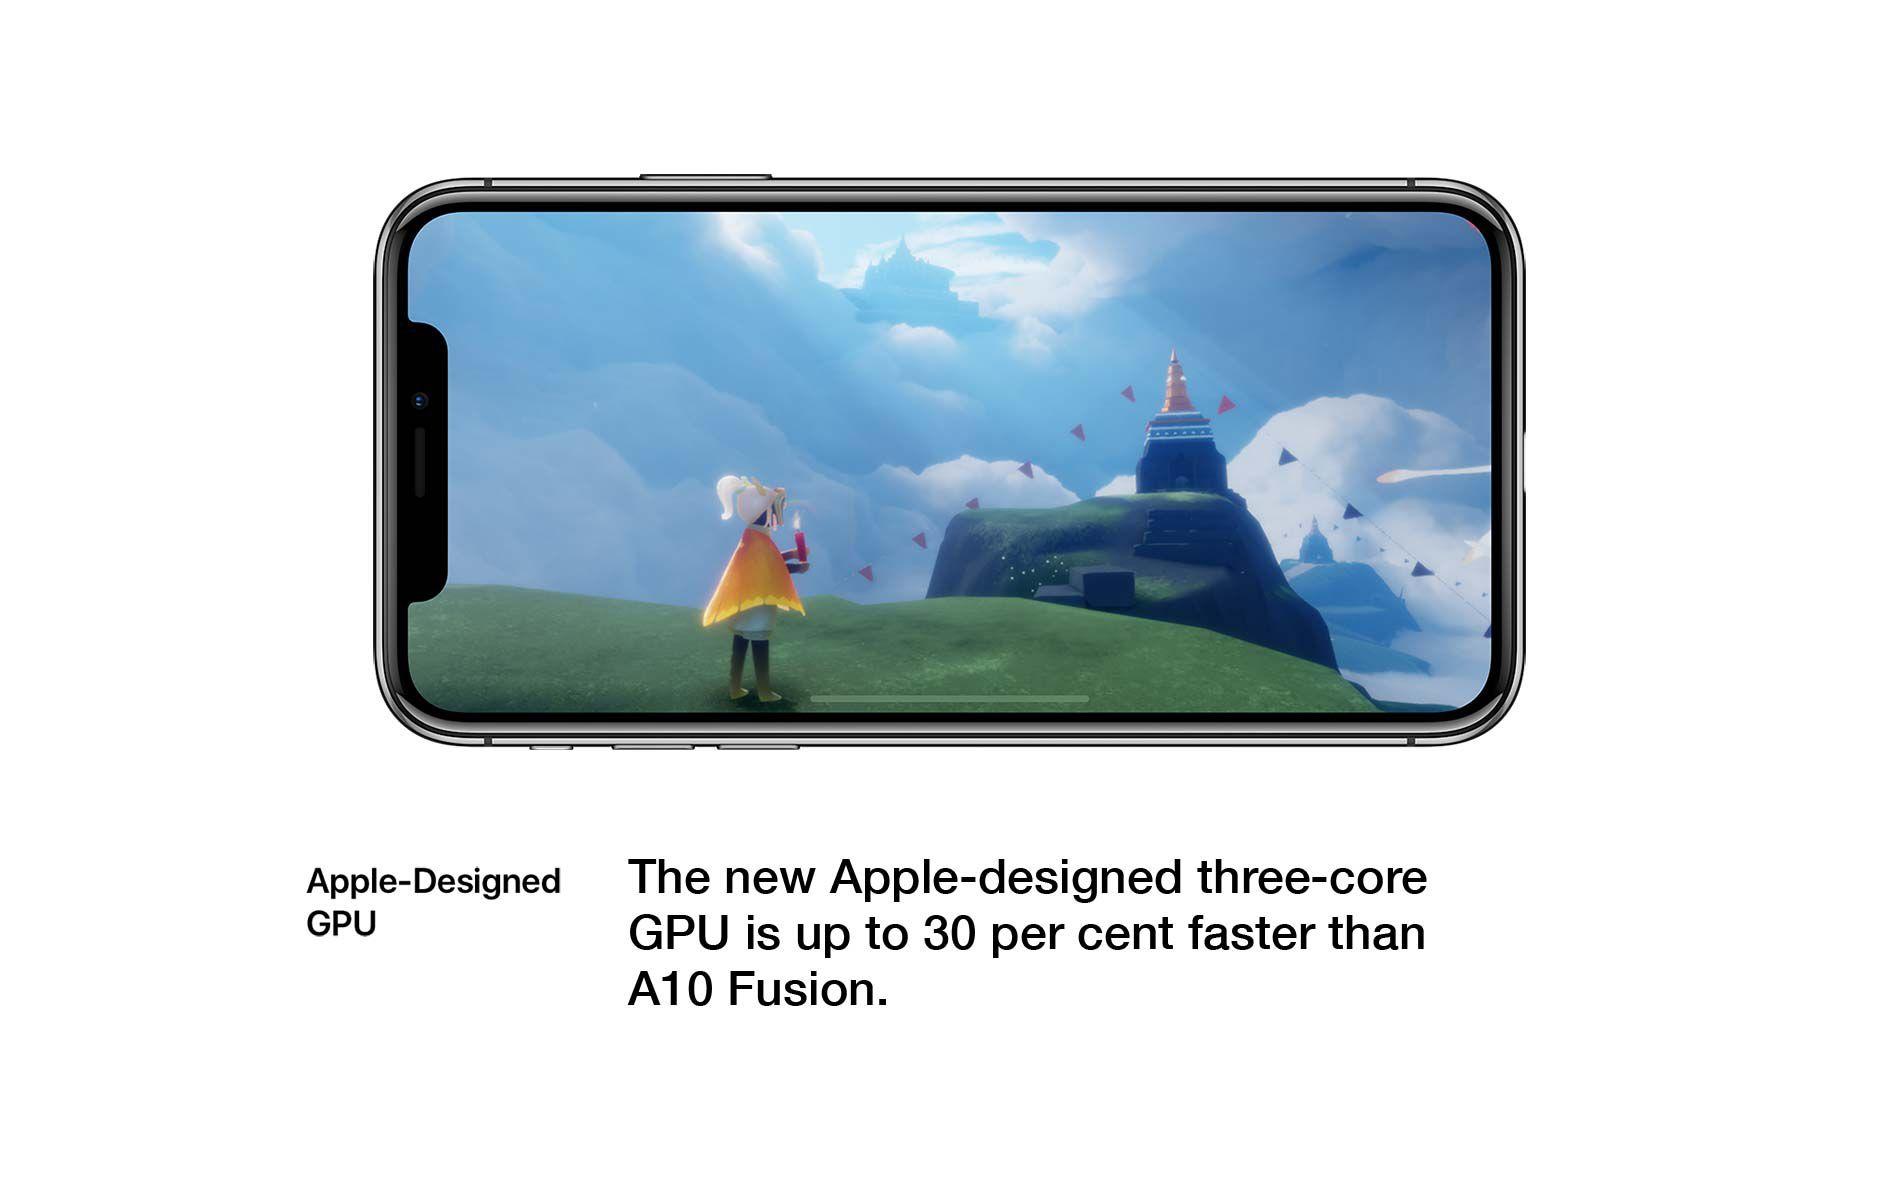 Apple-Designed GPU